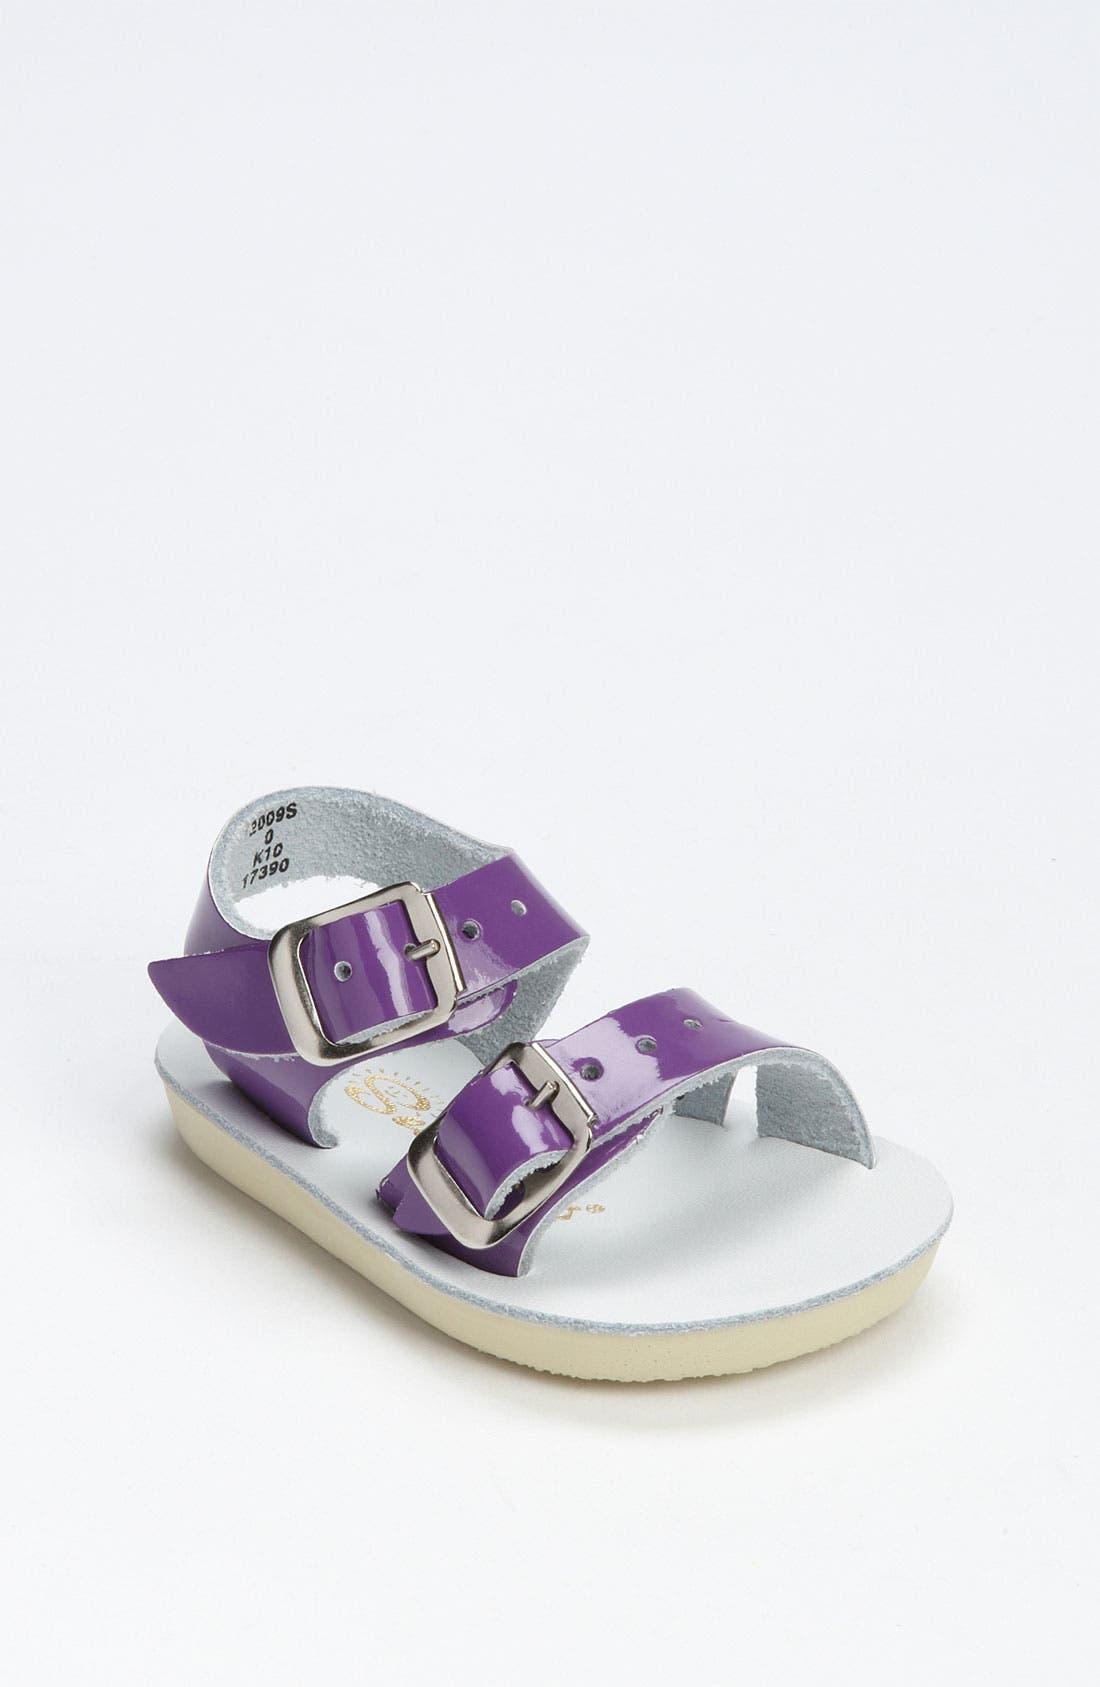 'Sea Wee' Sandal,                         Main,                         color, SHINY PURPLE